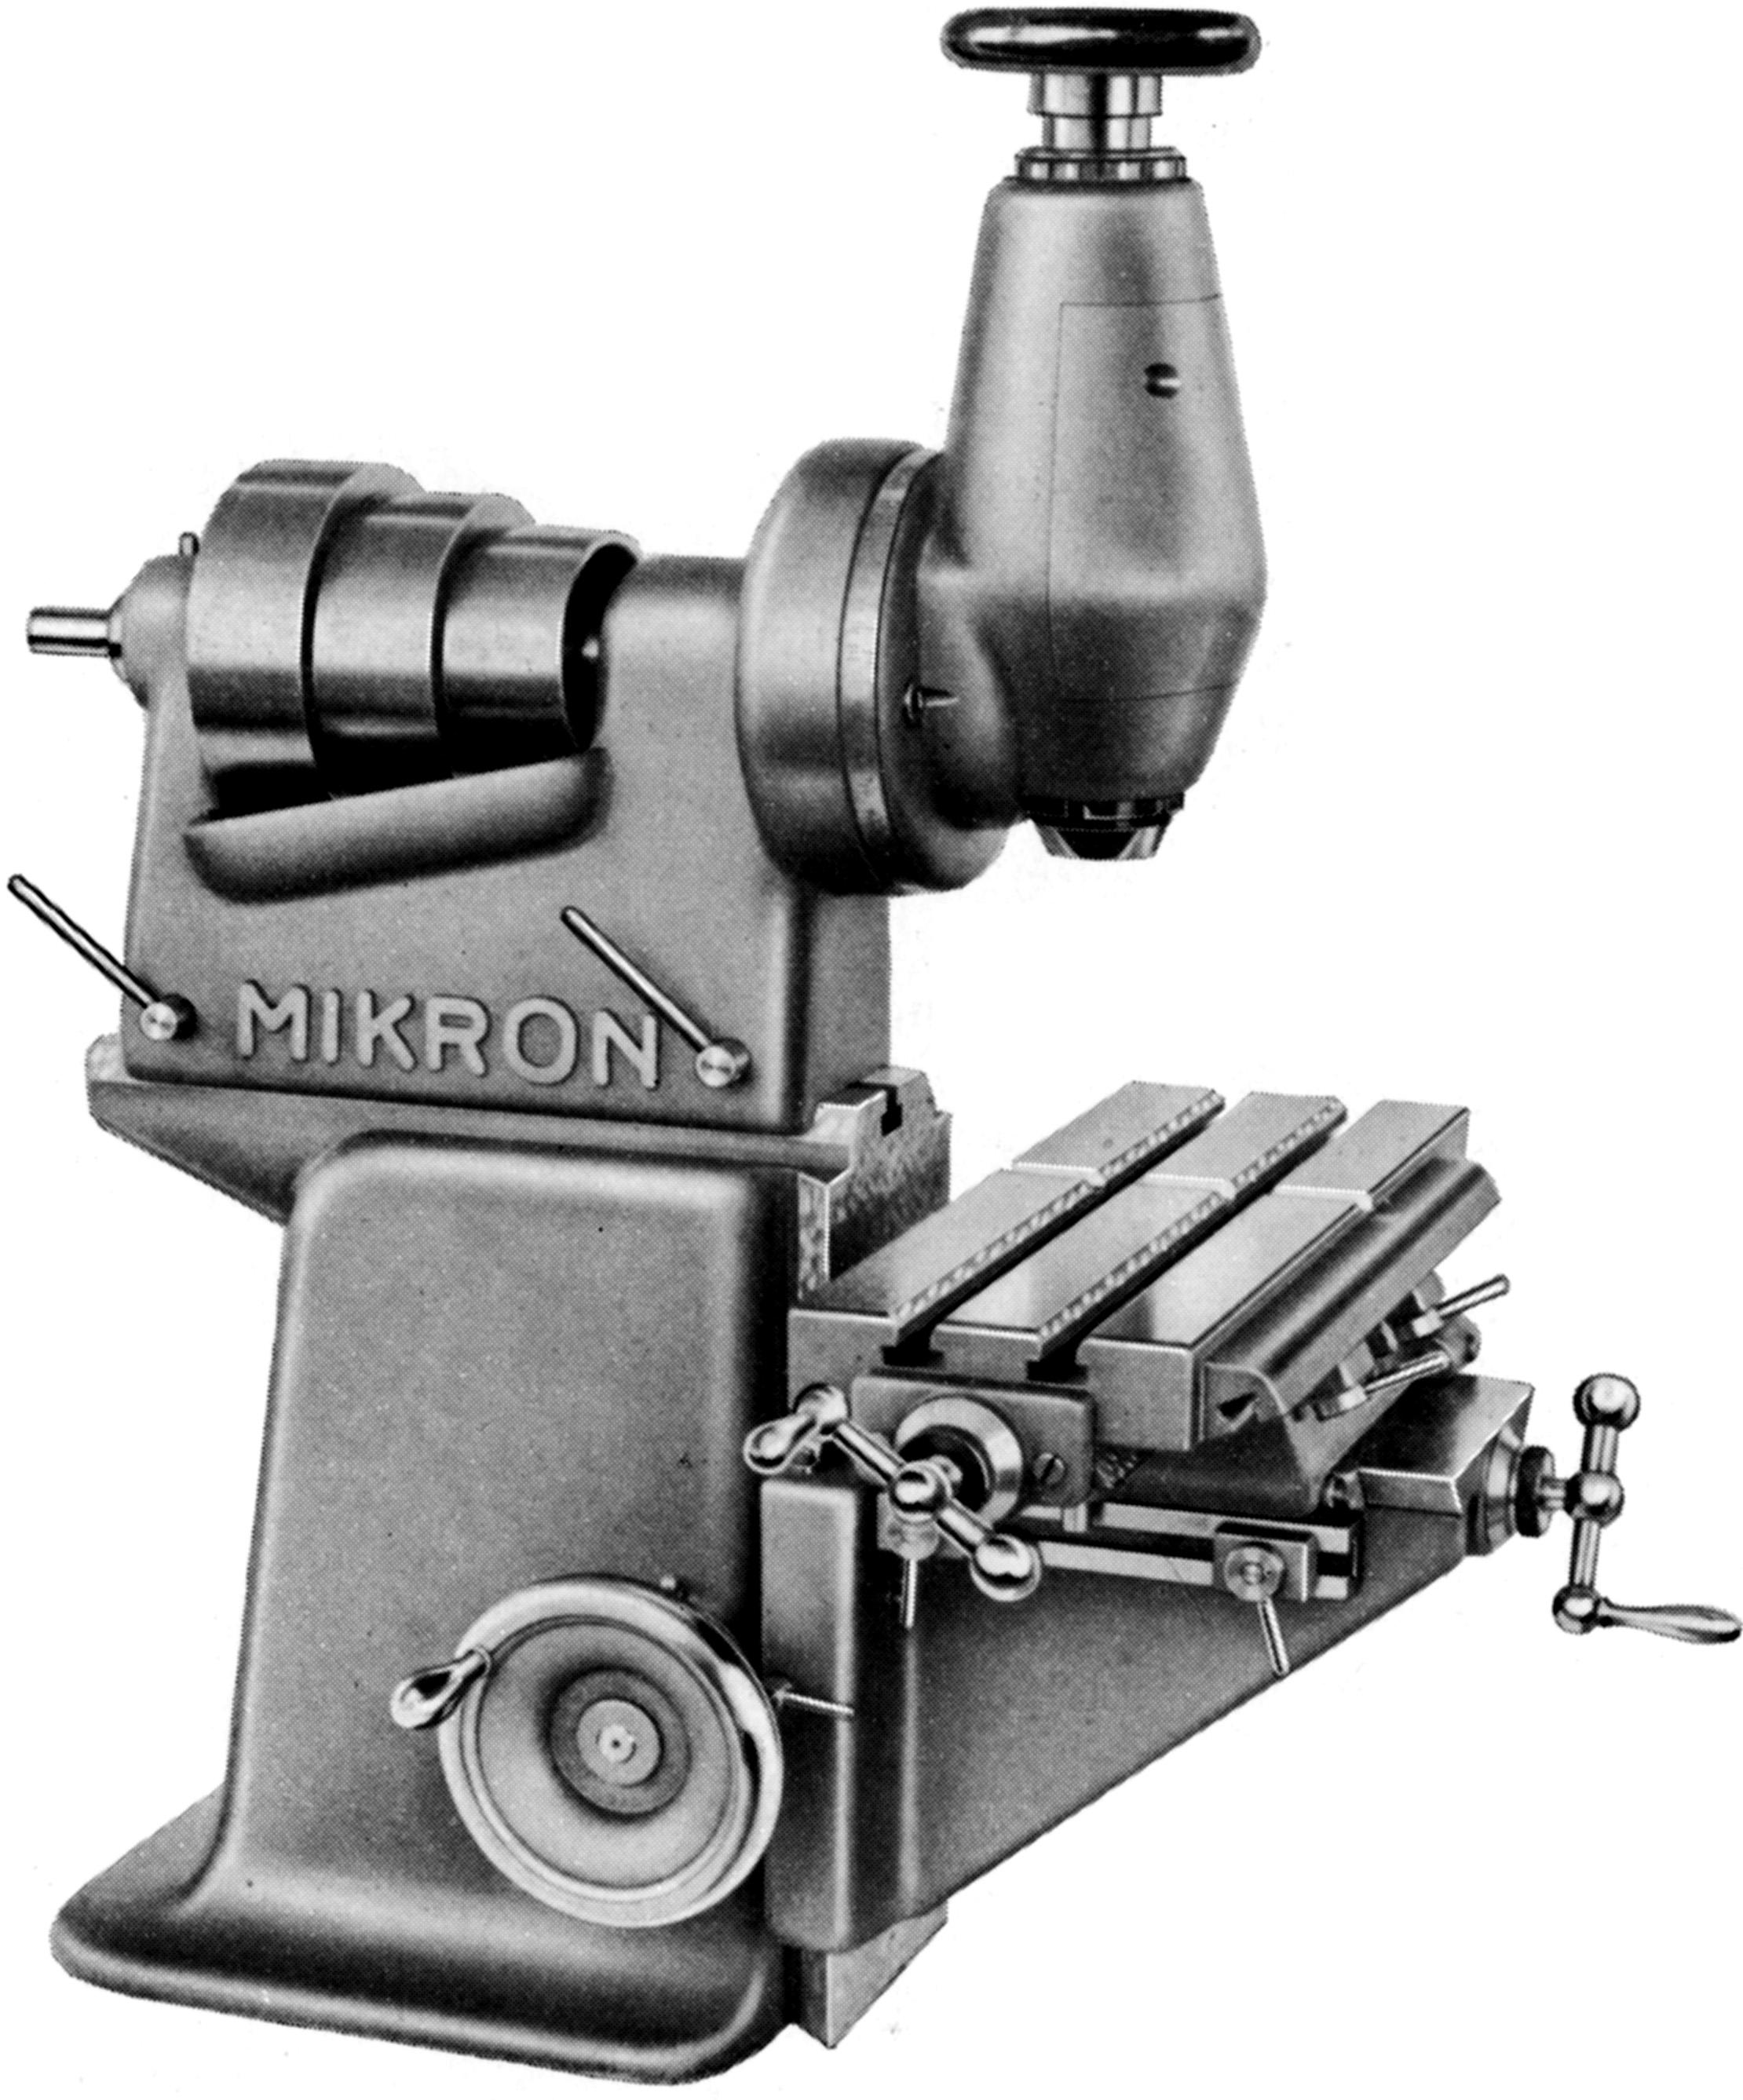 micron machine